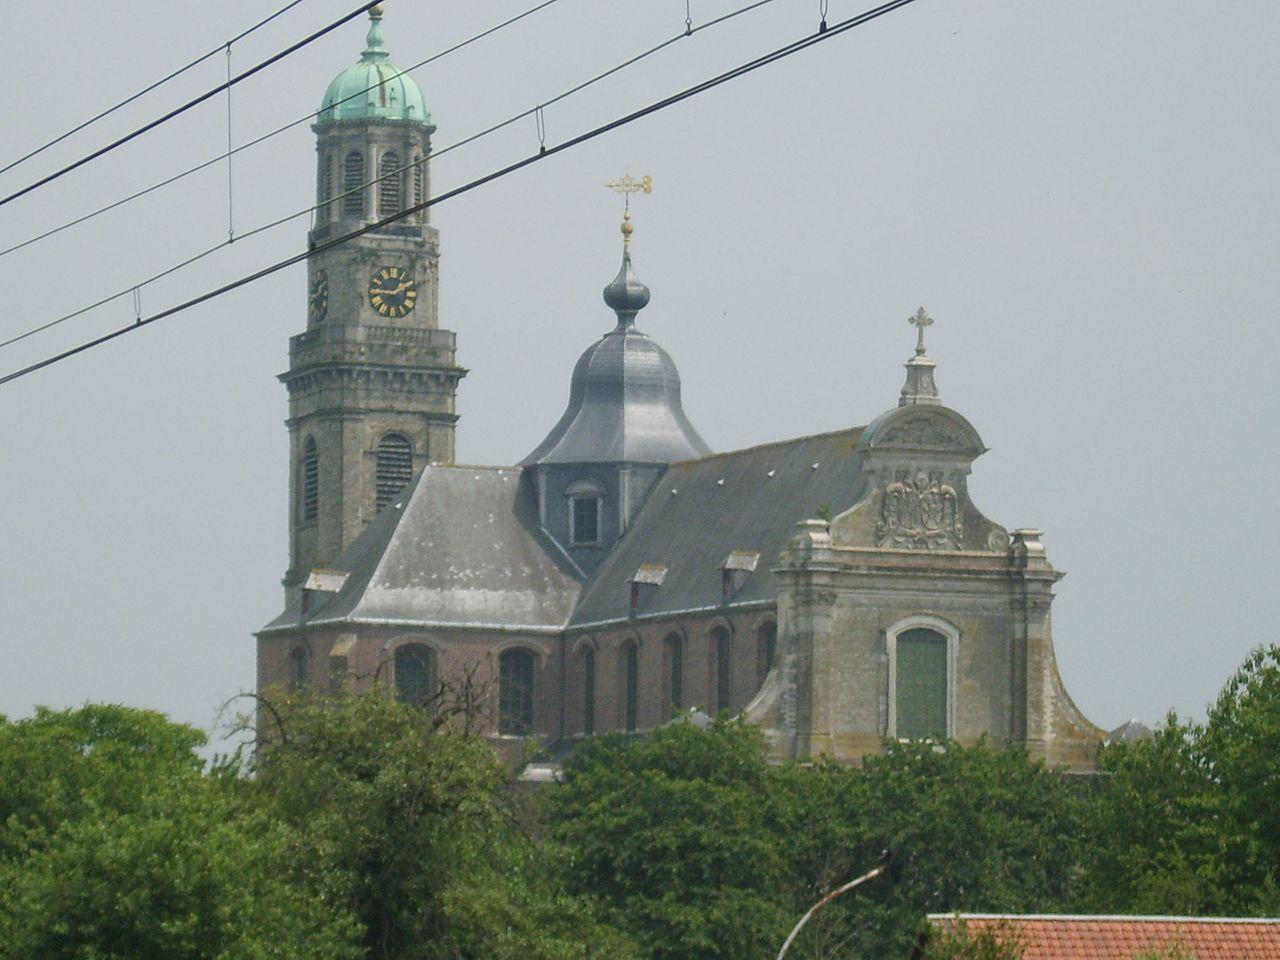 Fichier:Ninove church 2.jpg — Wikipédia